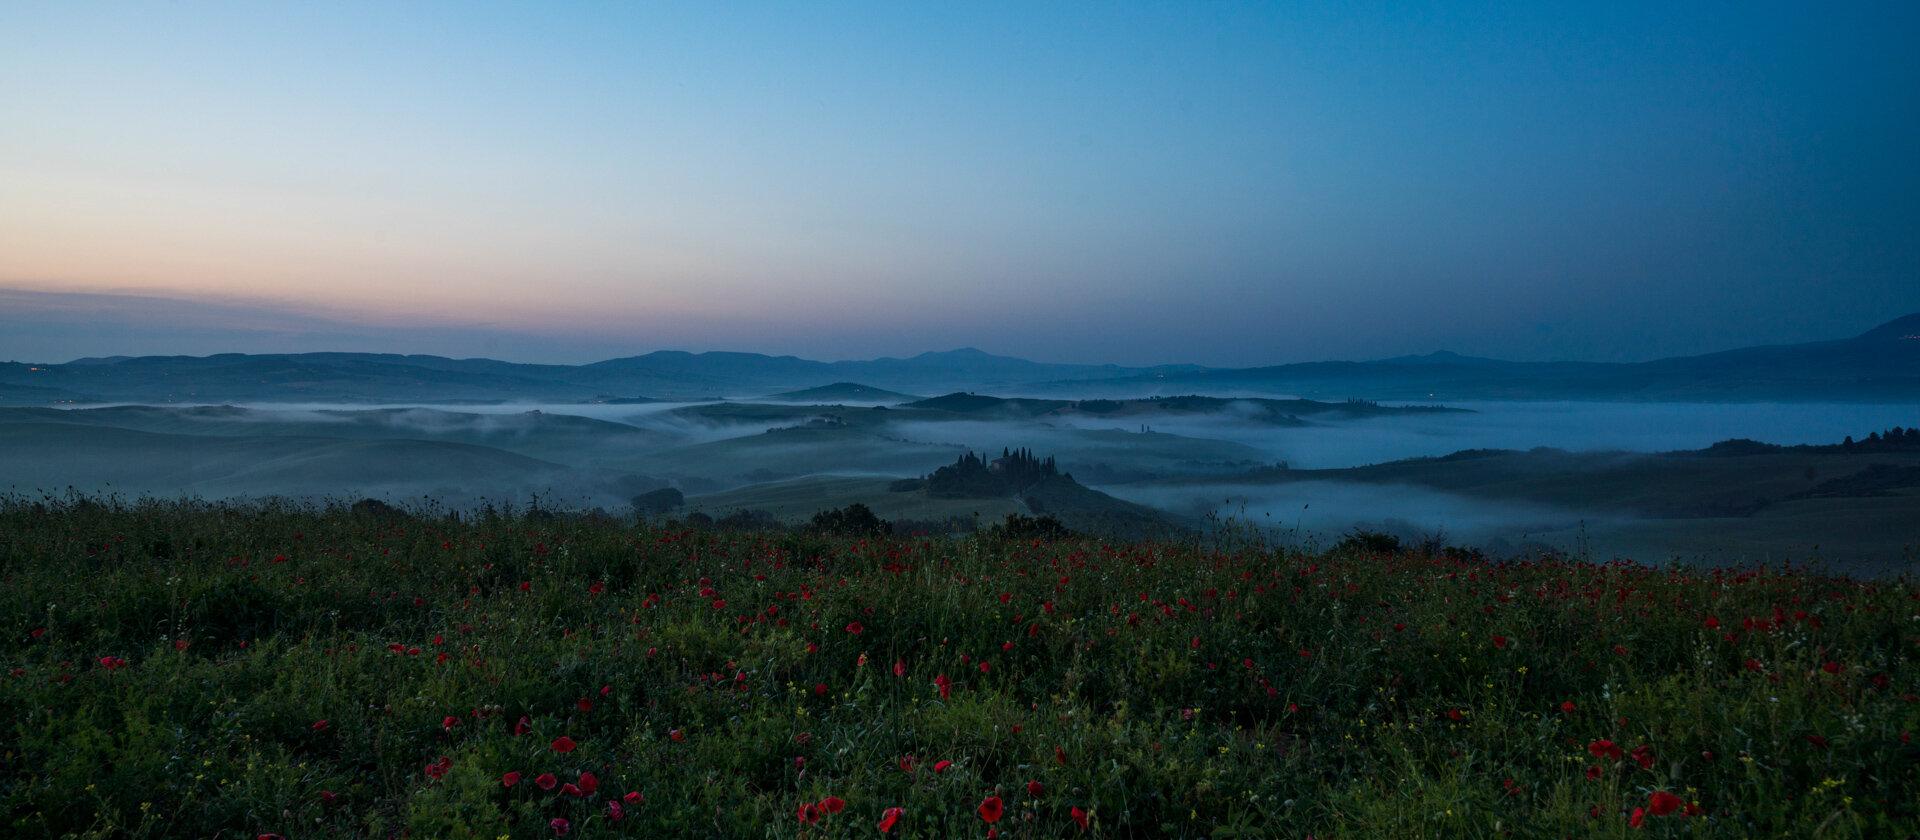 Sunrise at Podere Belvedere valley  PHOTOGRAPHY: MIRKO FIN • Sony Alpha 7R MkIII • SONY FE 55mm Ƒ/4 ZA @ Ƒ/11 • 1.3 sec • ISO 100